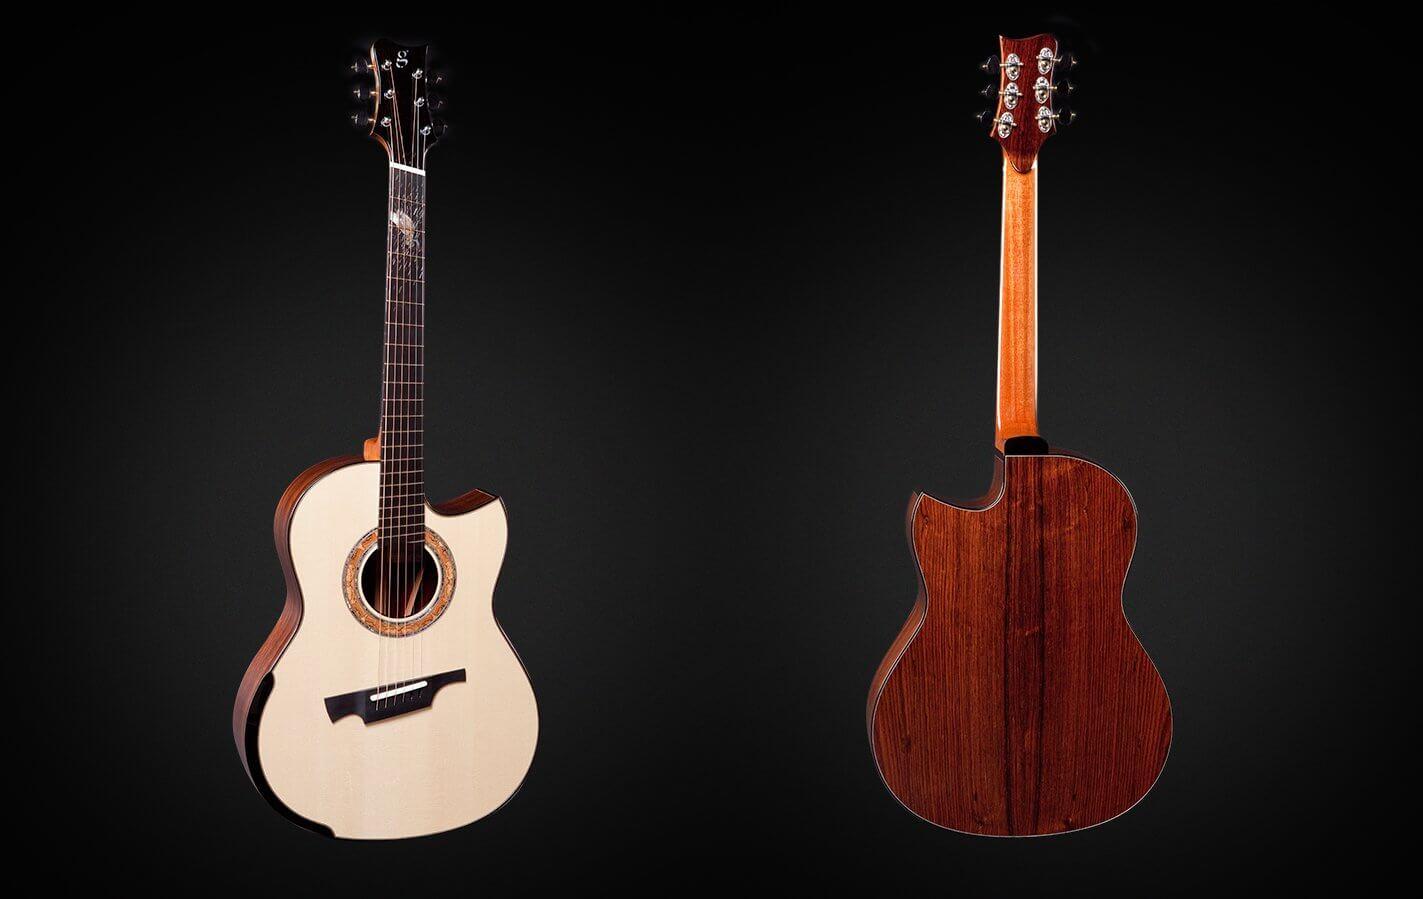 Greenfield Guitars | Fine handmade Acoustic Guitars Model G1, DADGAD fanned fret, Alpine spruce, Amazon rosewood, the dragonfly, Laskin arm rest